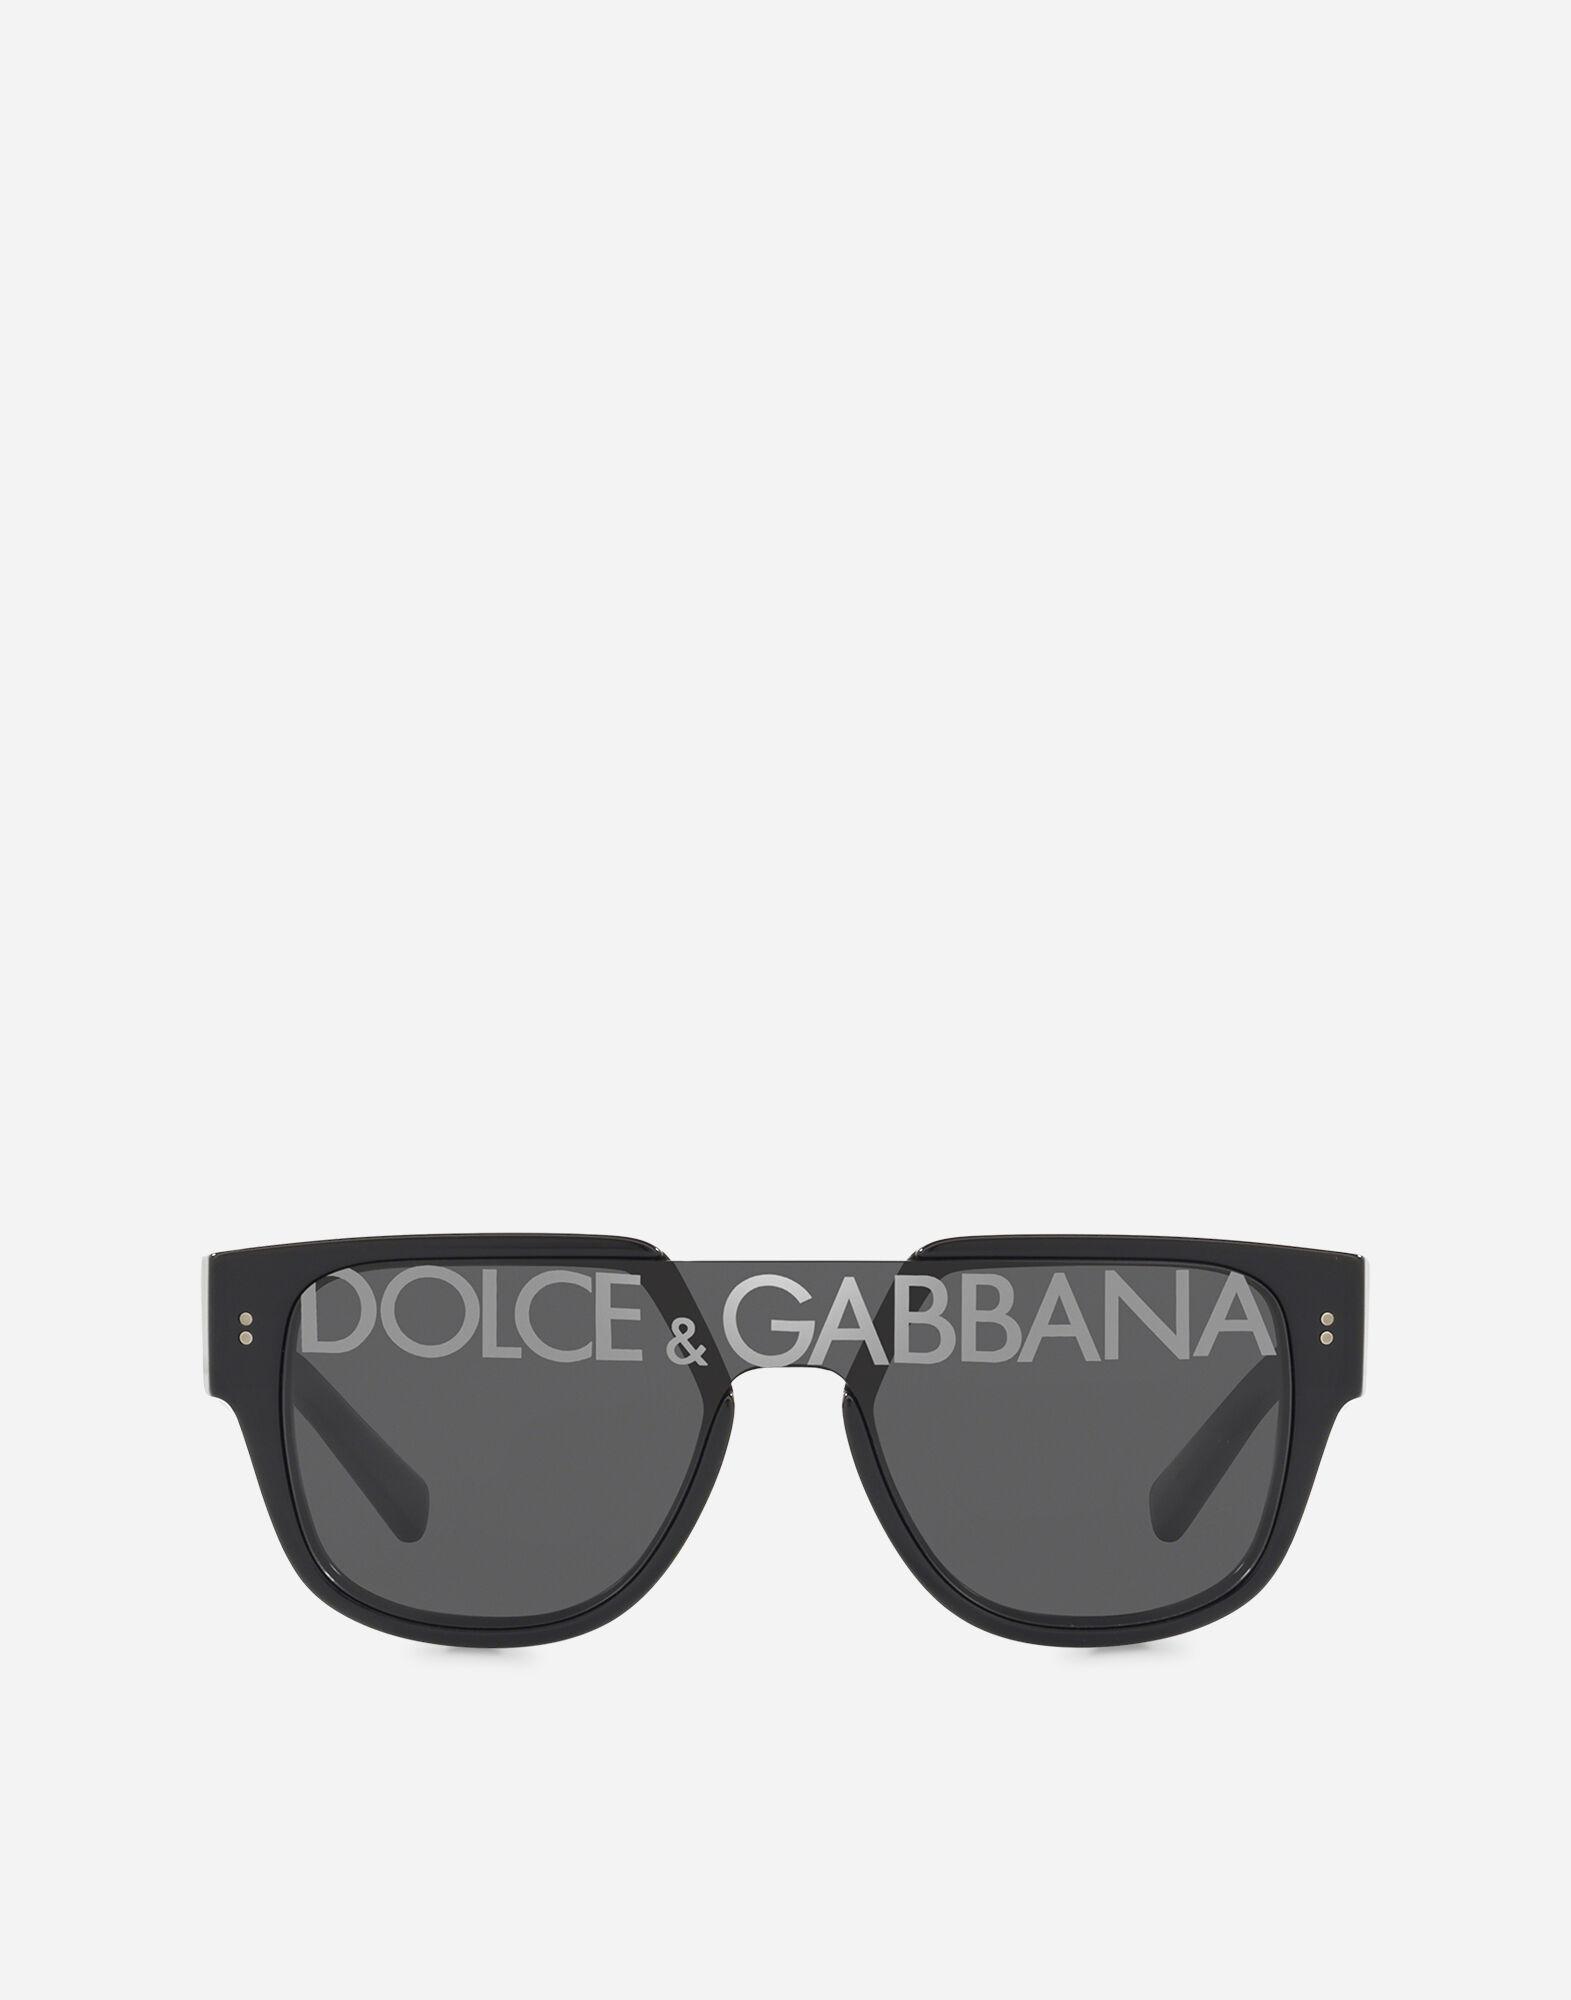 """domenico"" Men's amp;gabbana Dolce Sunglasses ""domenico"" amp;gabbana Sunglasses Men's Dolce Sunglasses Dolce Men's frxwArIqZ"